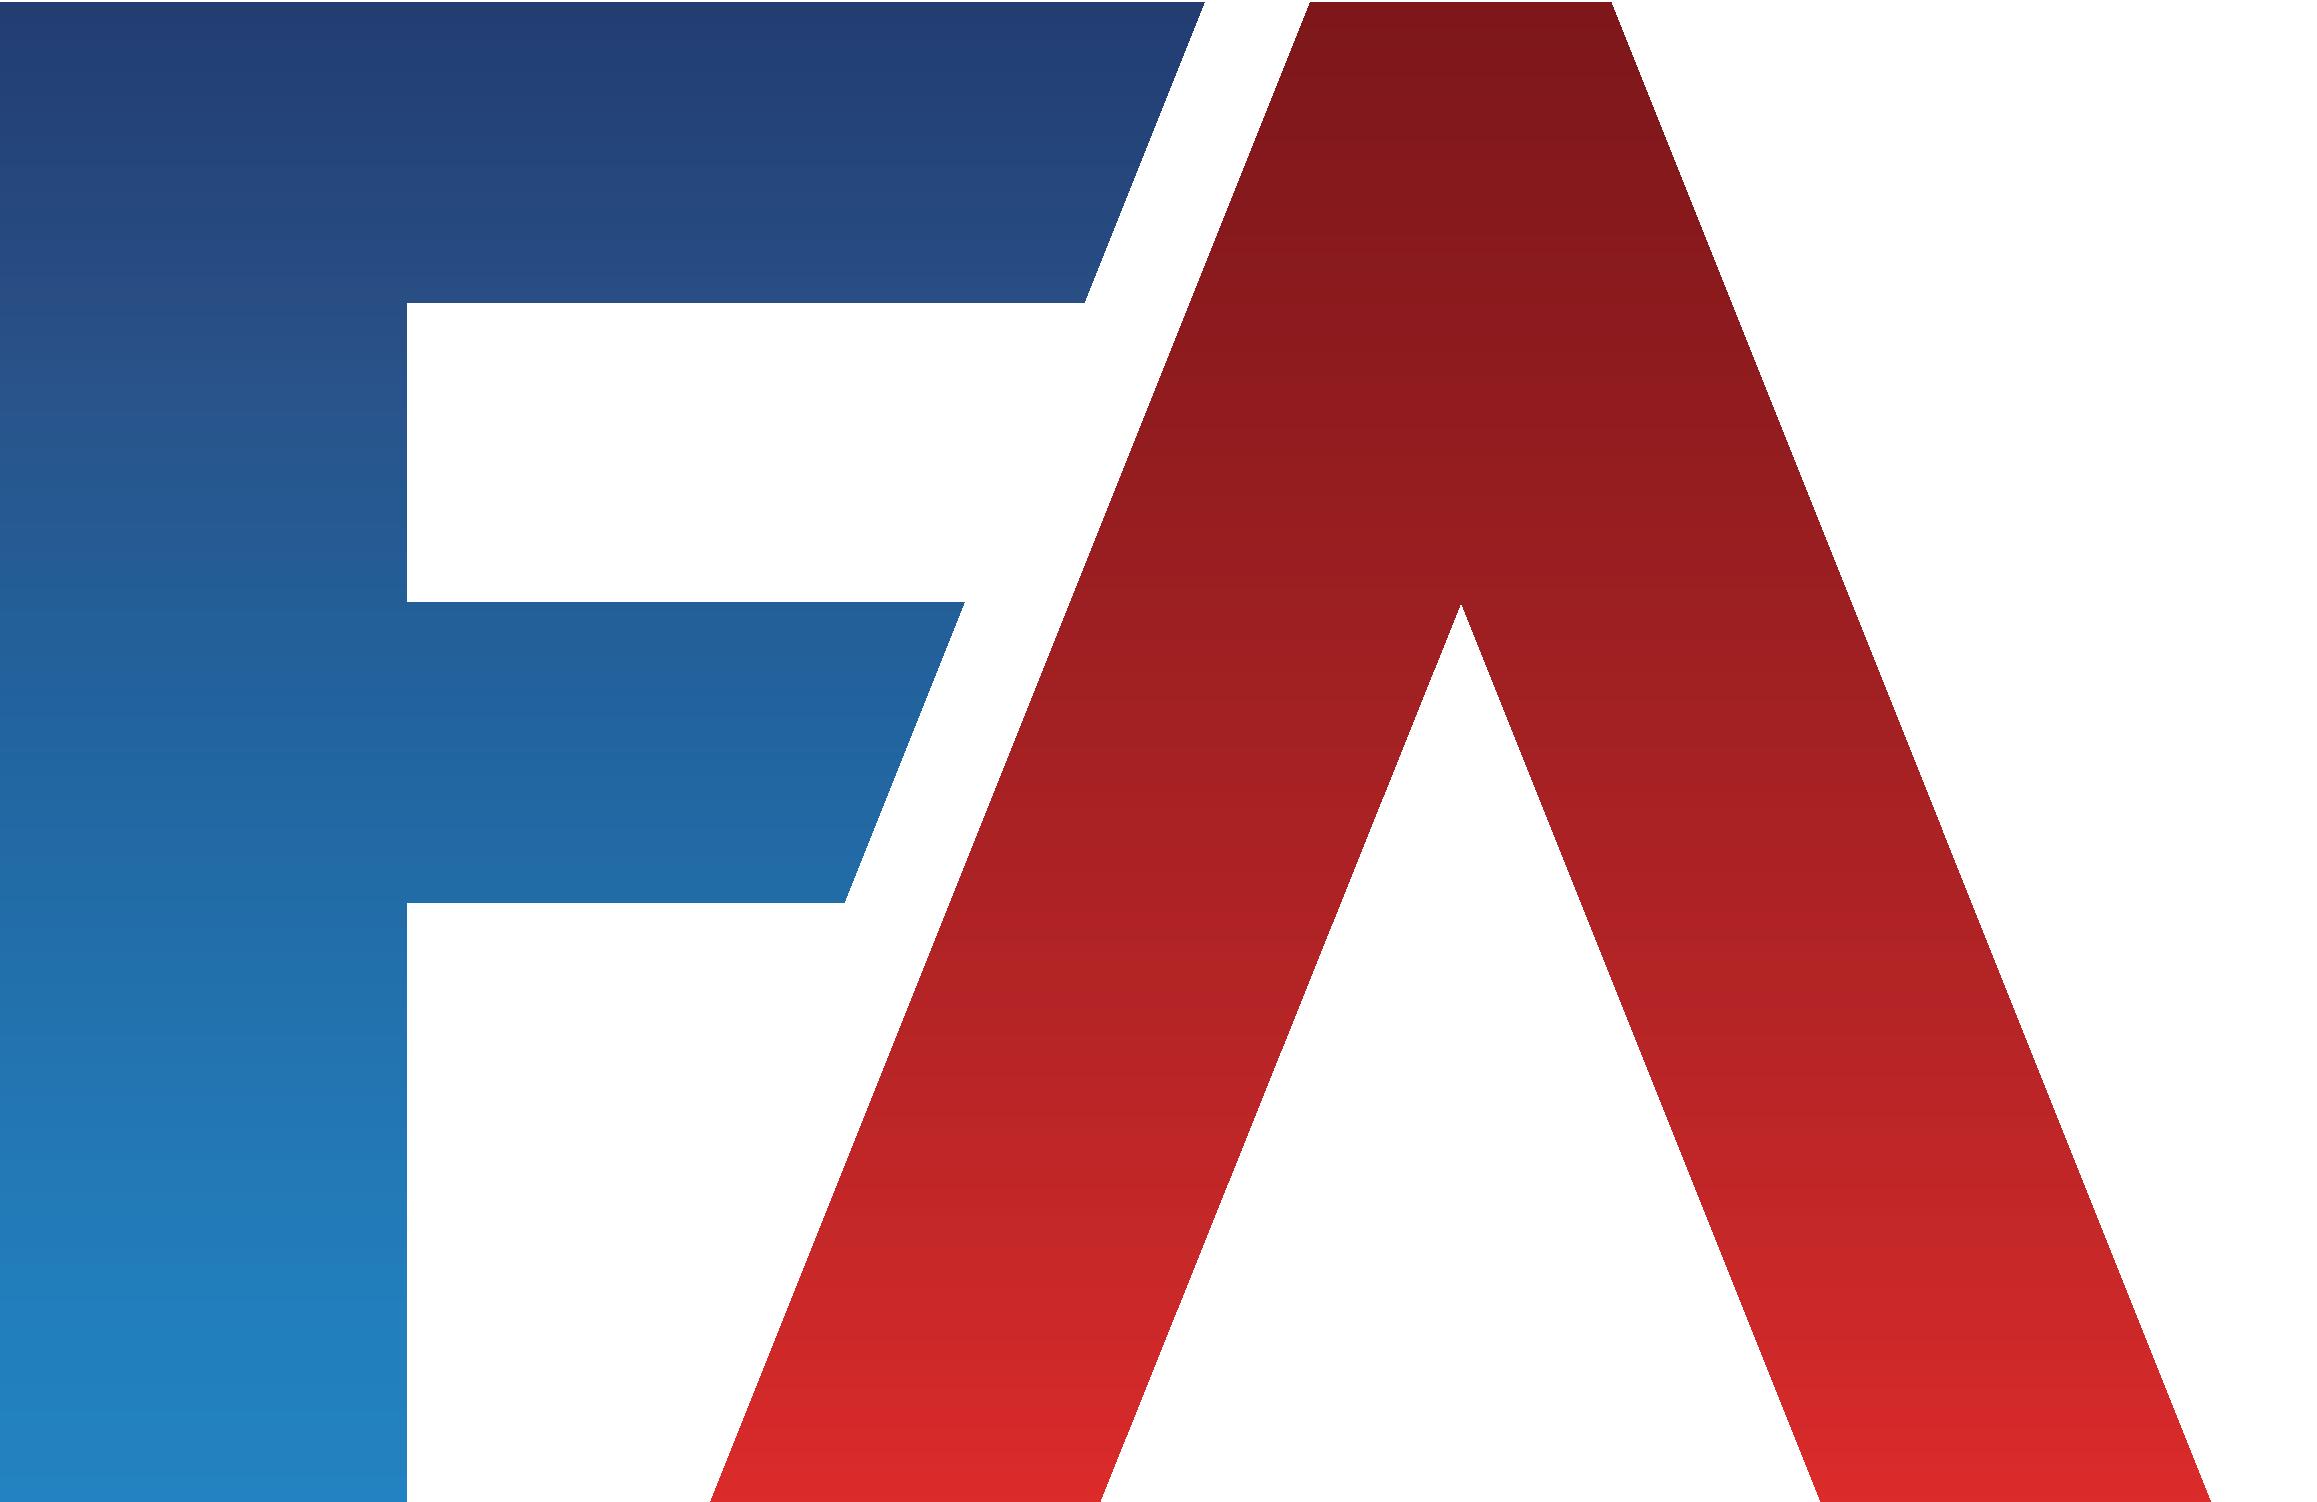 Fantasy Sports Business: Media & Lawmakers Need Education | FantasyAlarm.com